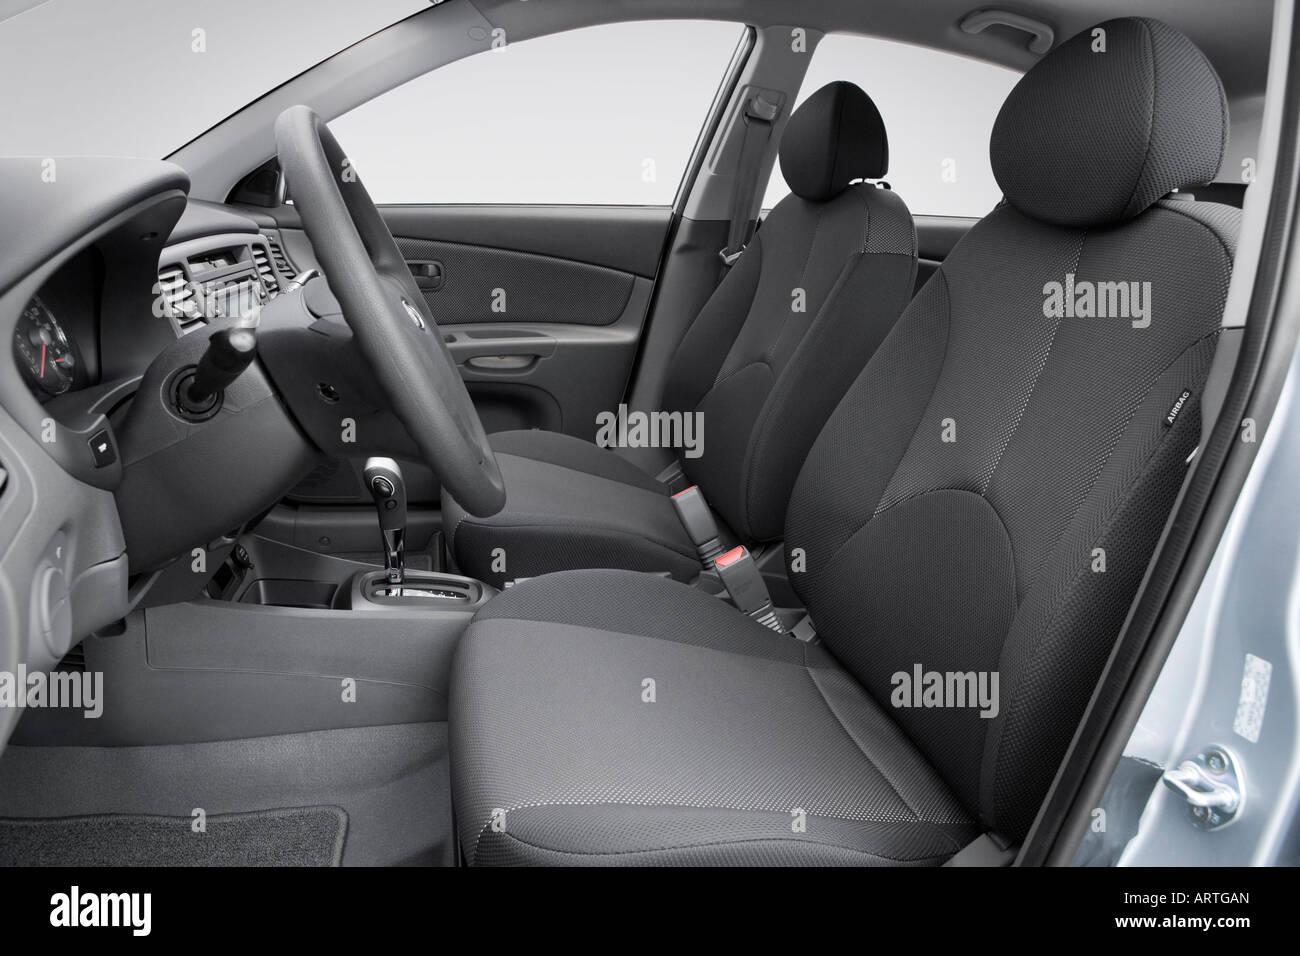 2008 Kia Rio 5 Lx In Silver Front Seats Stock Photo Alamy